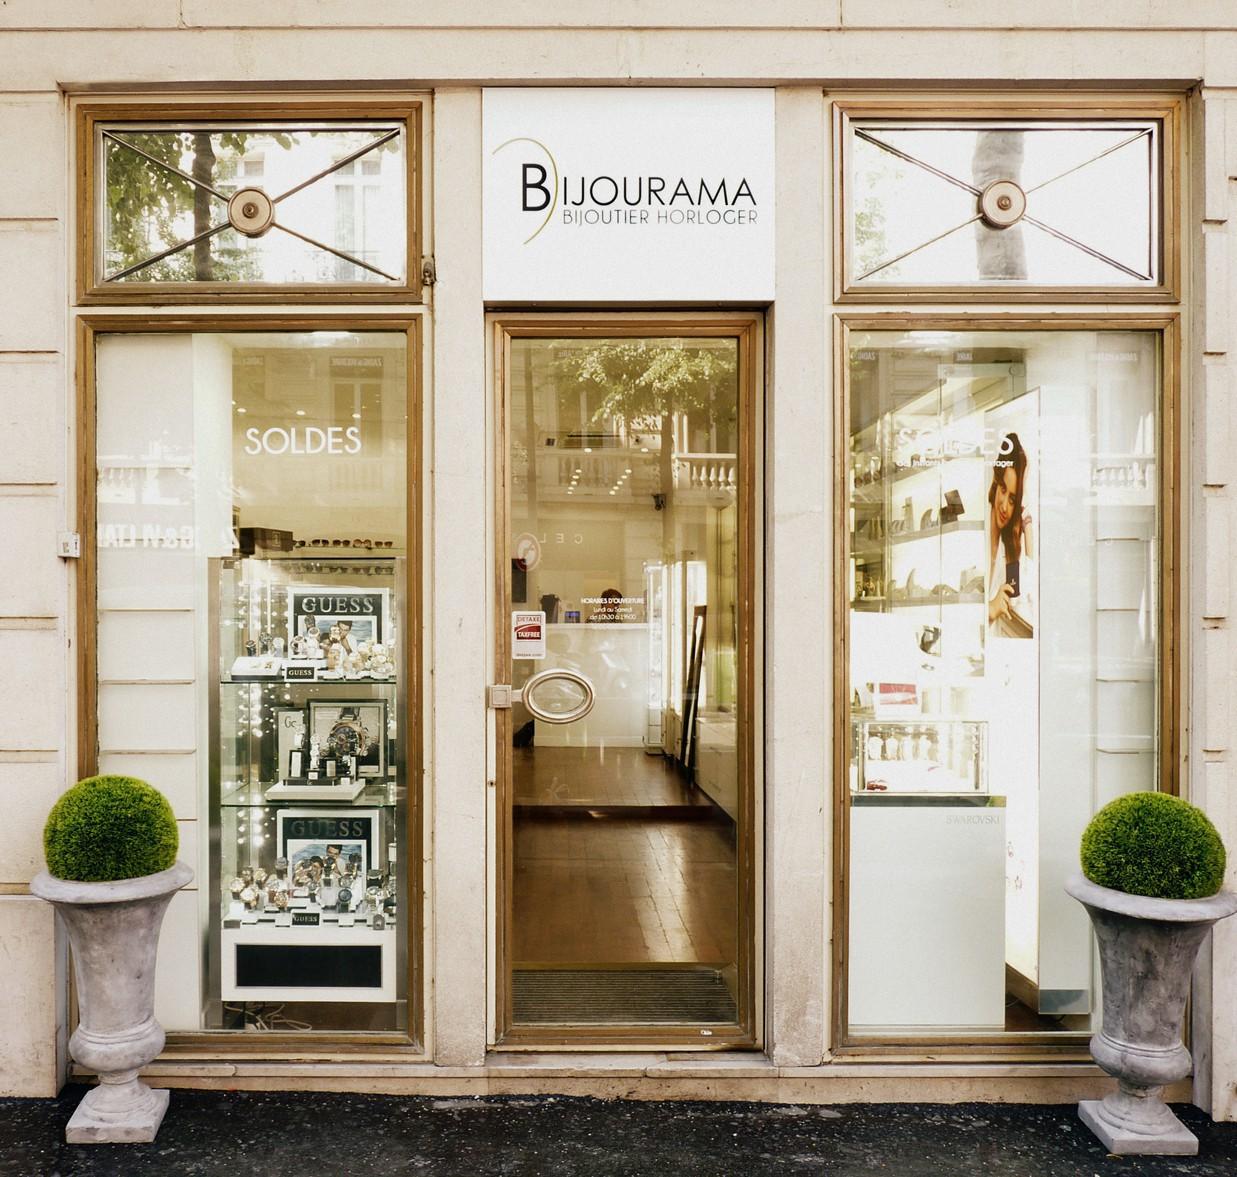 Boutique bijourama notre magasin parisien - Boutique avenue victor hugo ...